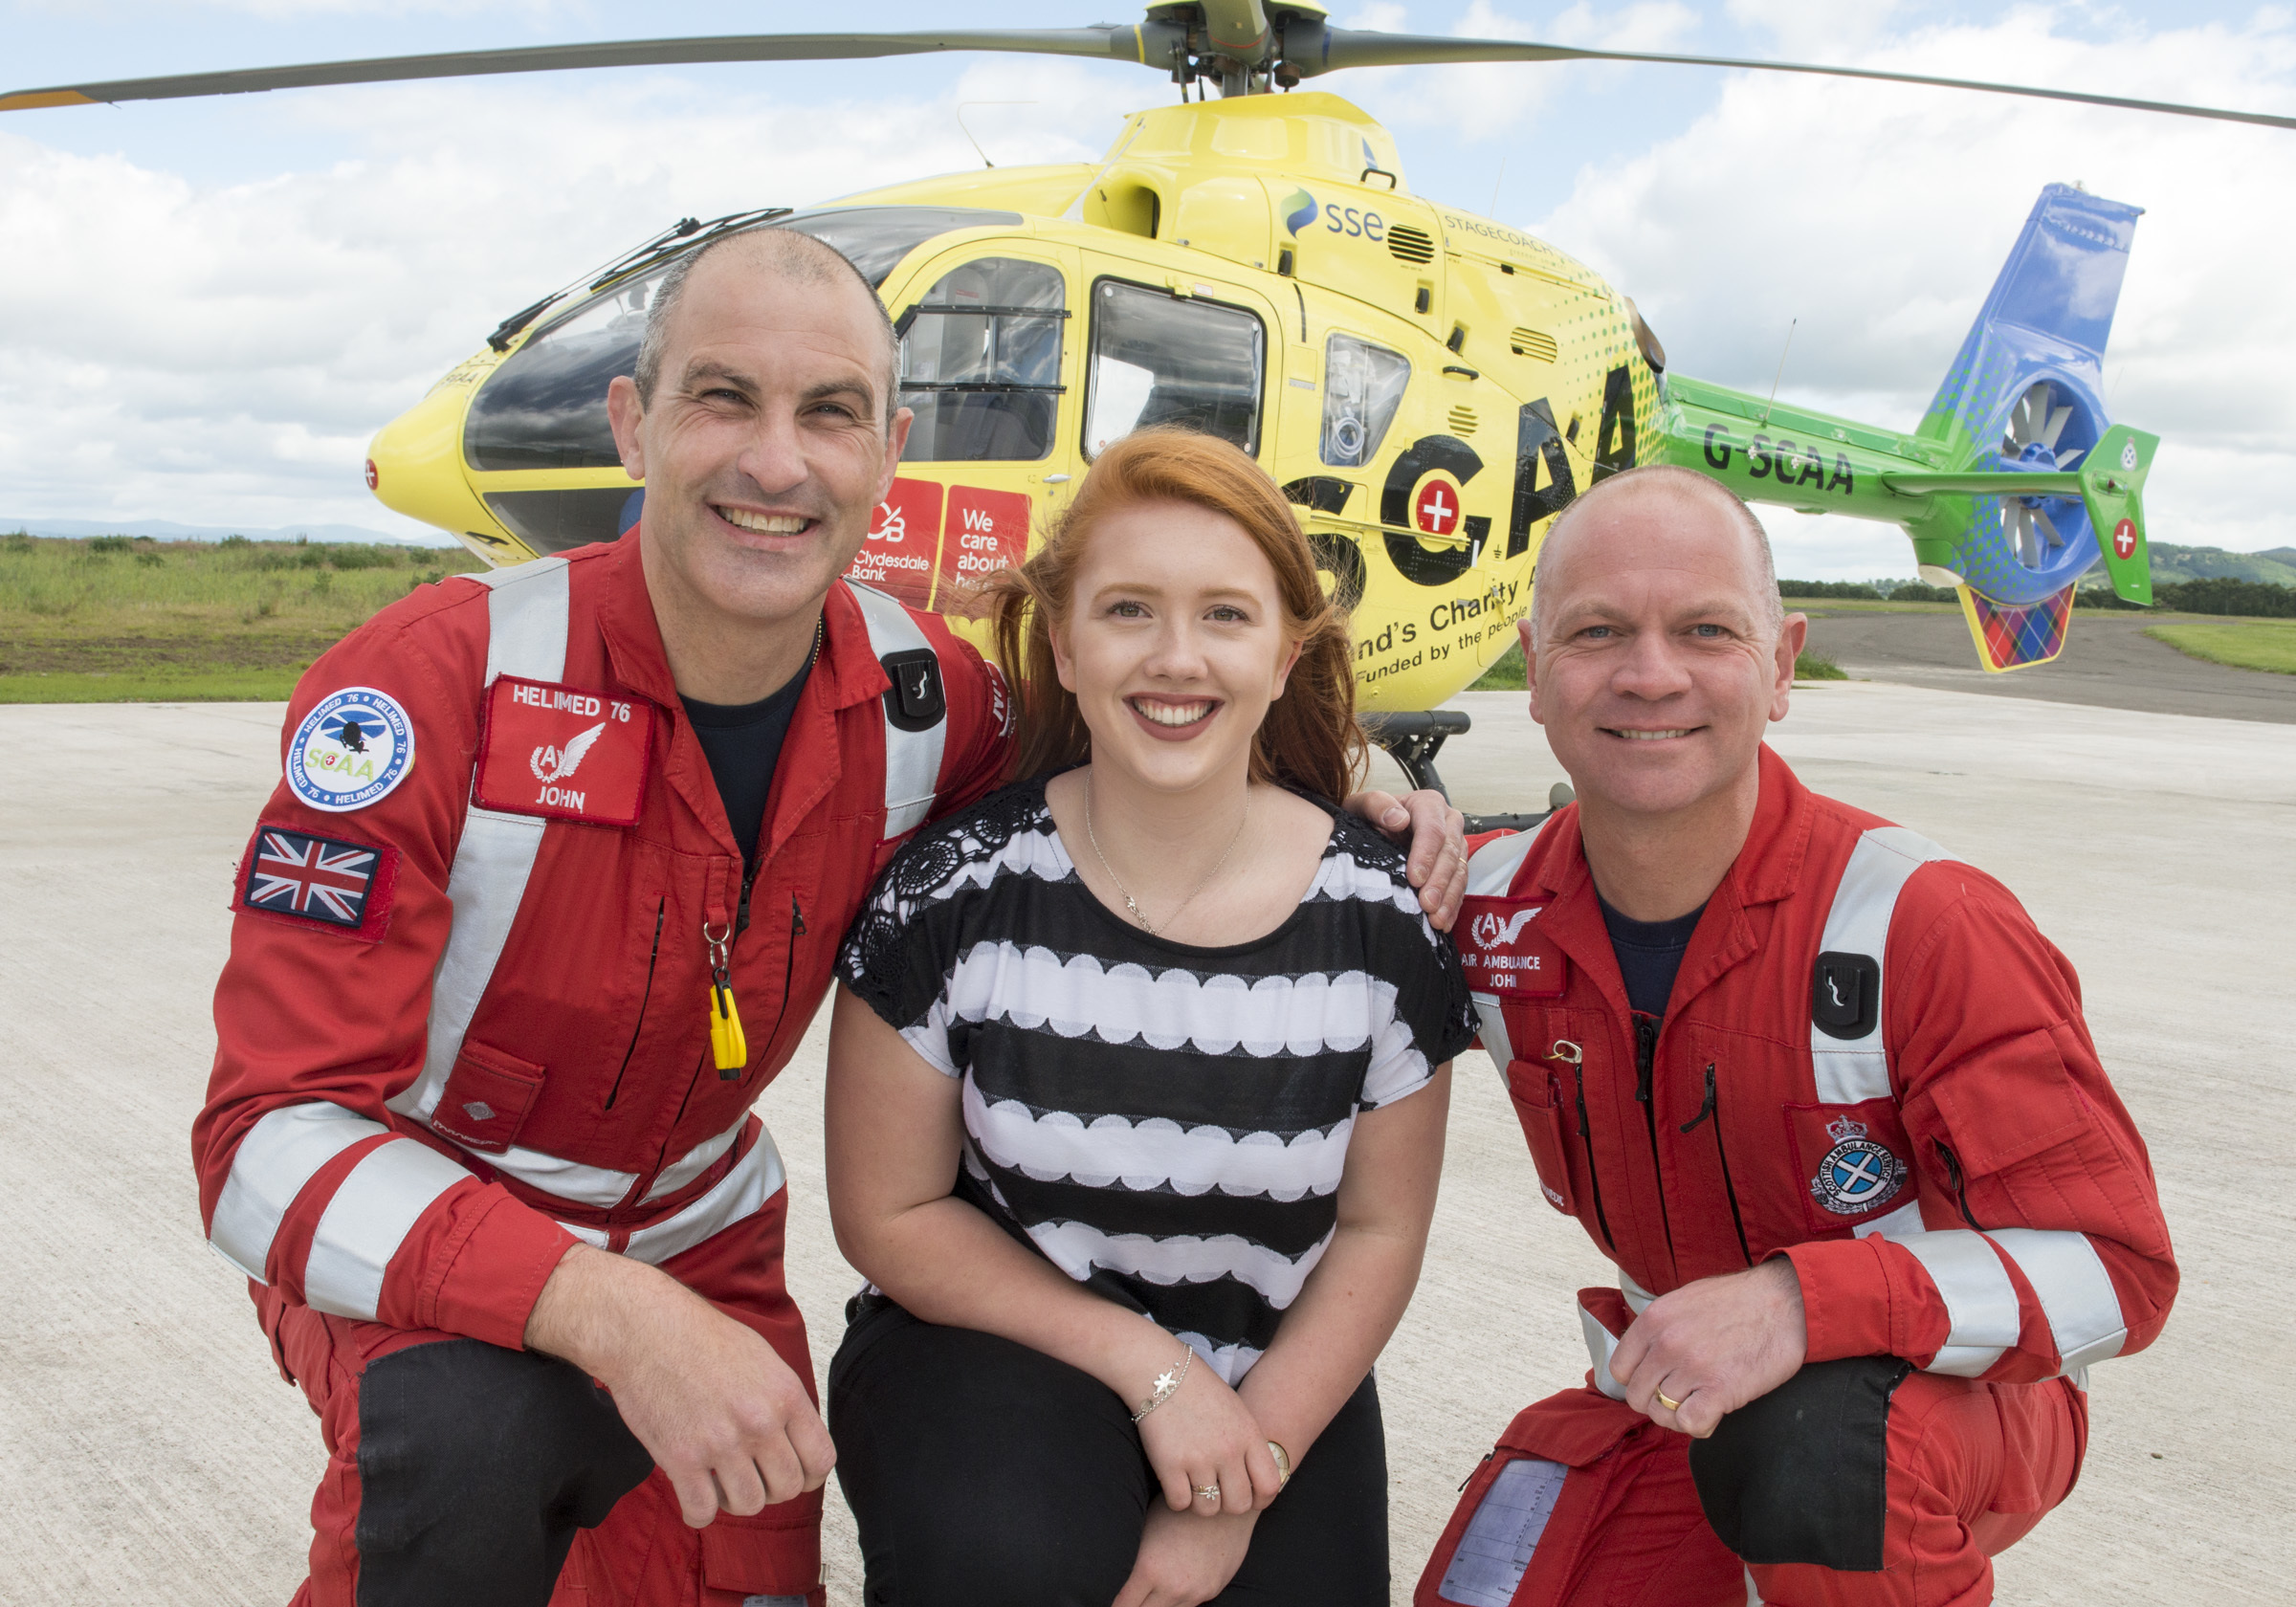 Lucy Smith with paramedics John Pritchard and John Salmond.